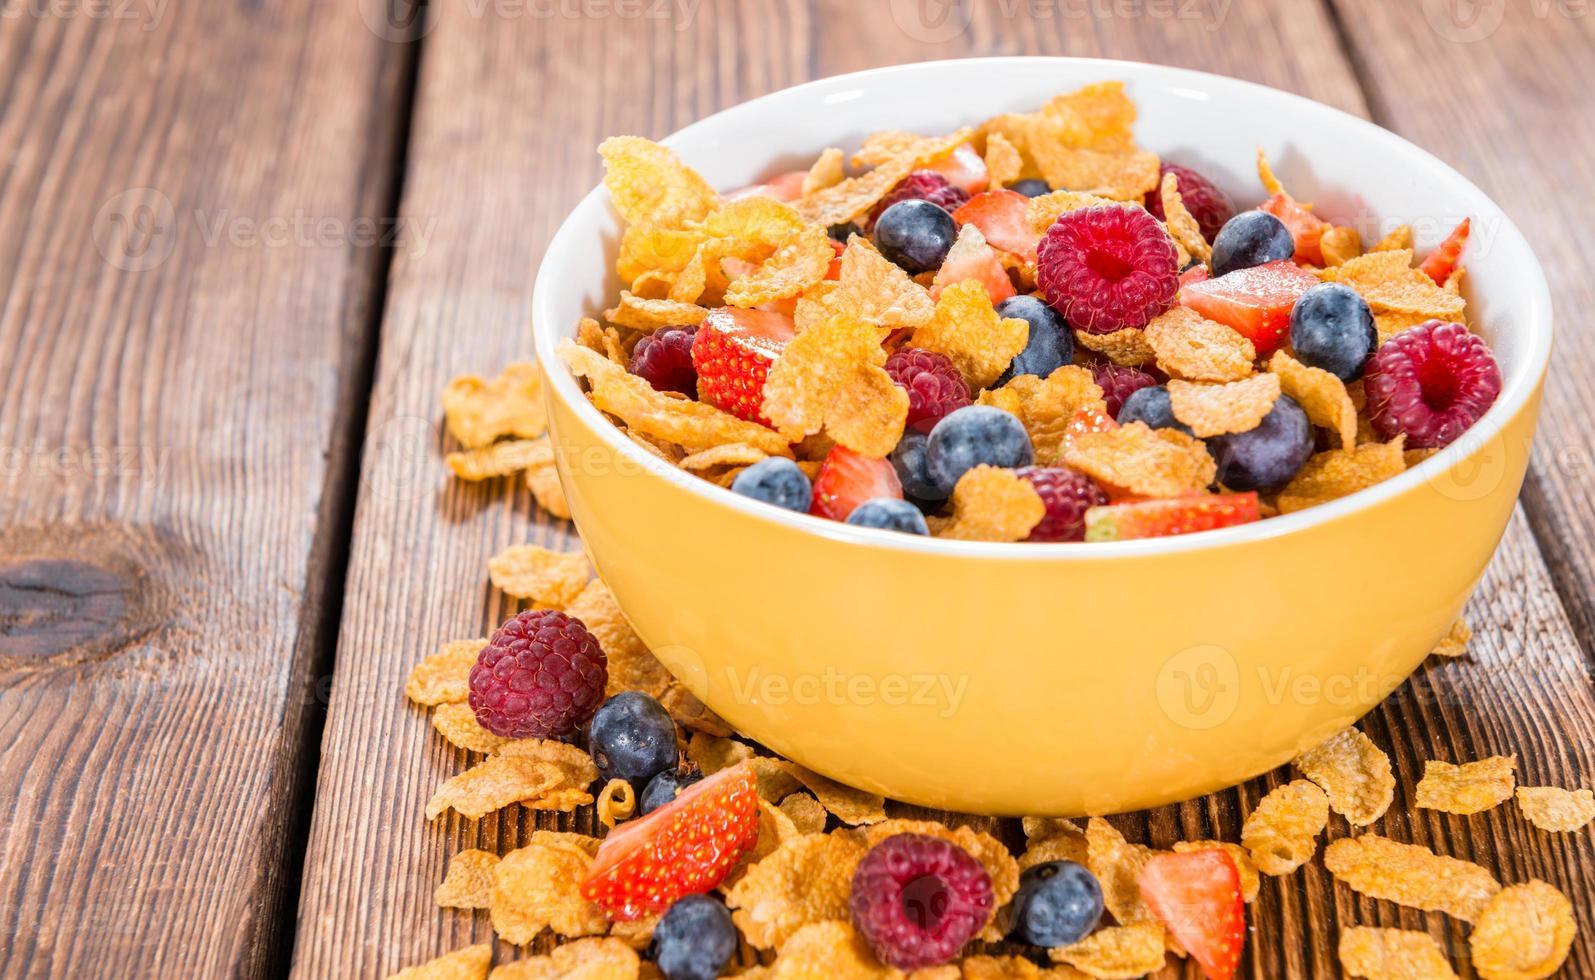 Breakfast (Cornflakes and Berries) photo